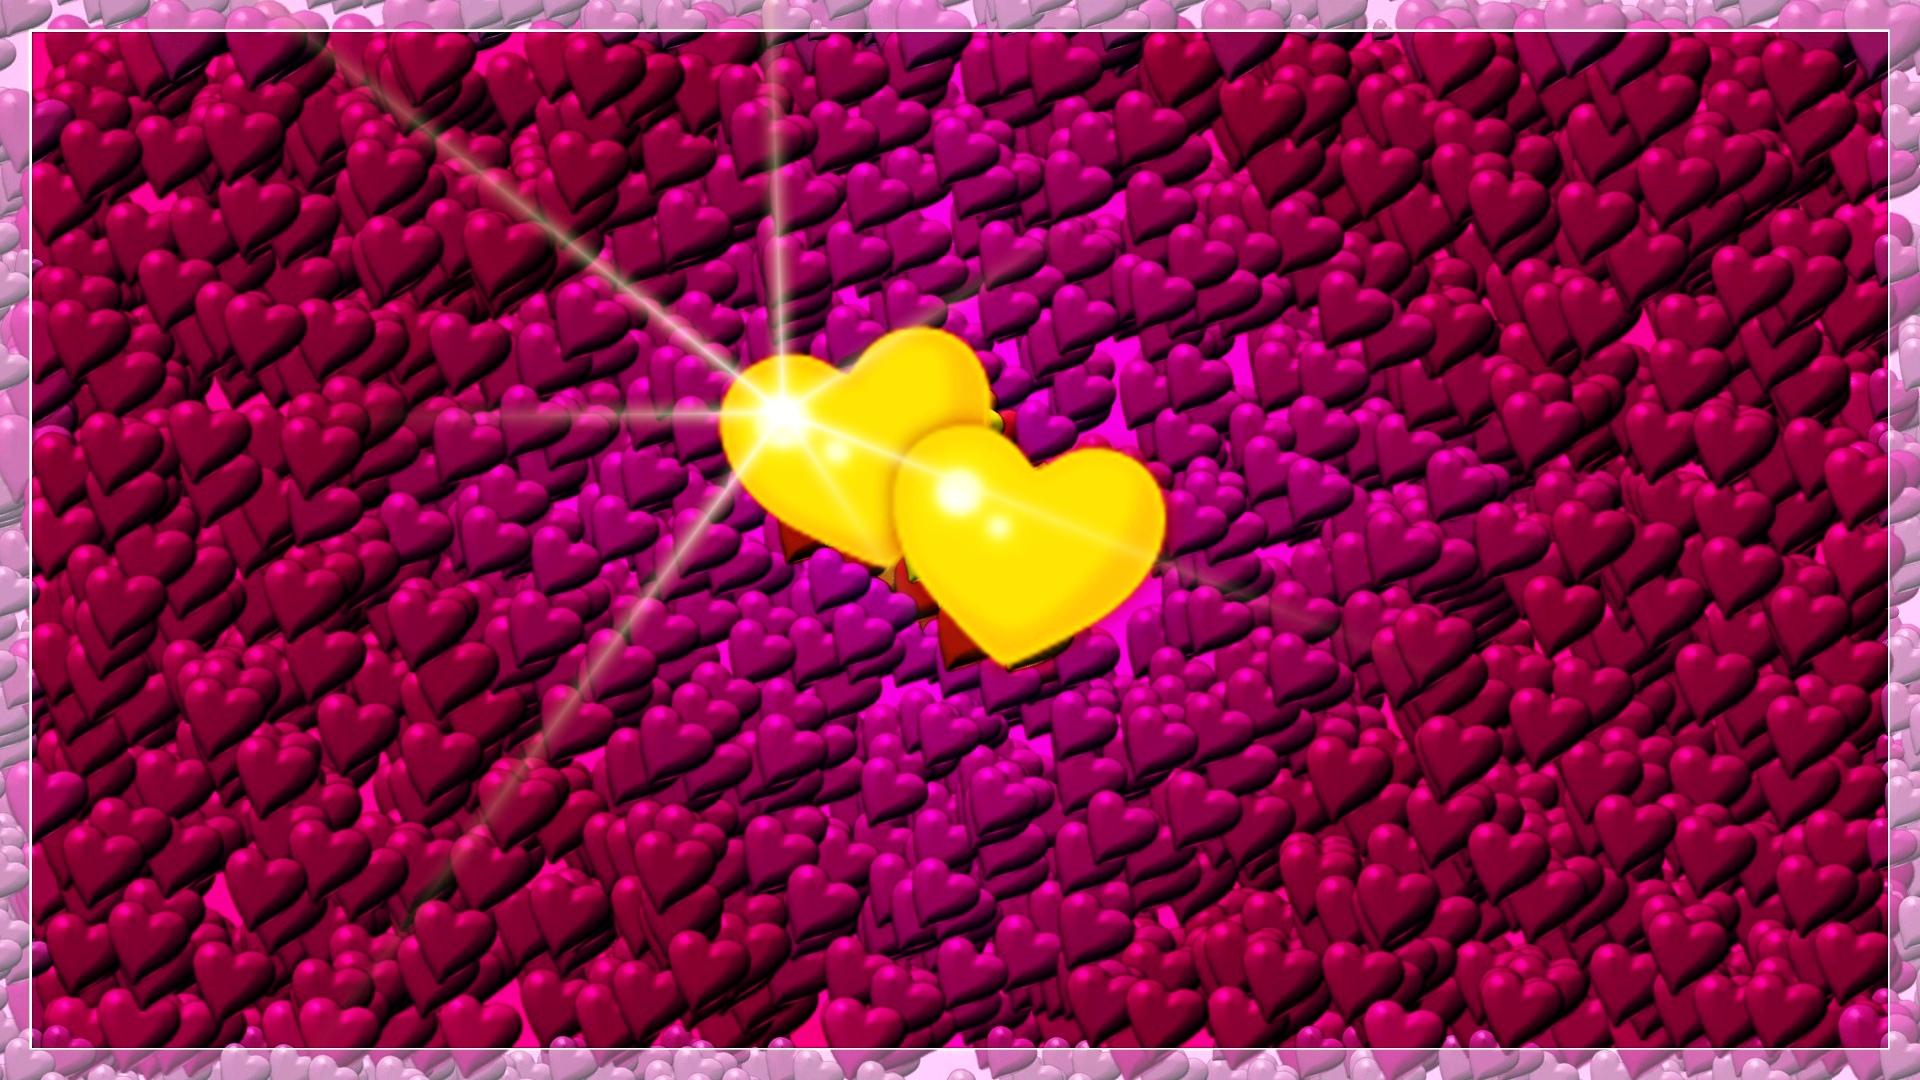 Wallpaper download free image search hd - Free Heart Wallpaper Downloads Hd Wallpaper Love Hearts